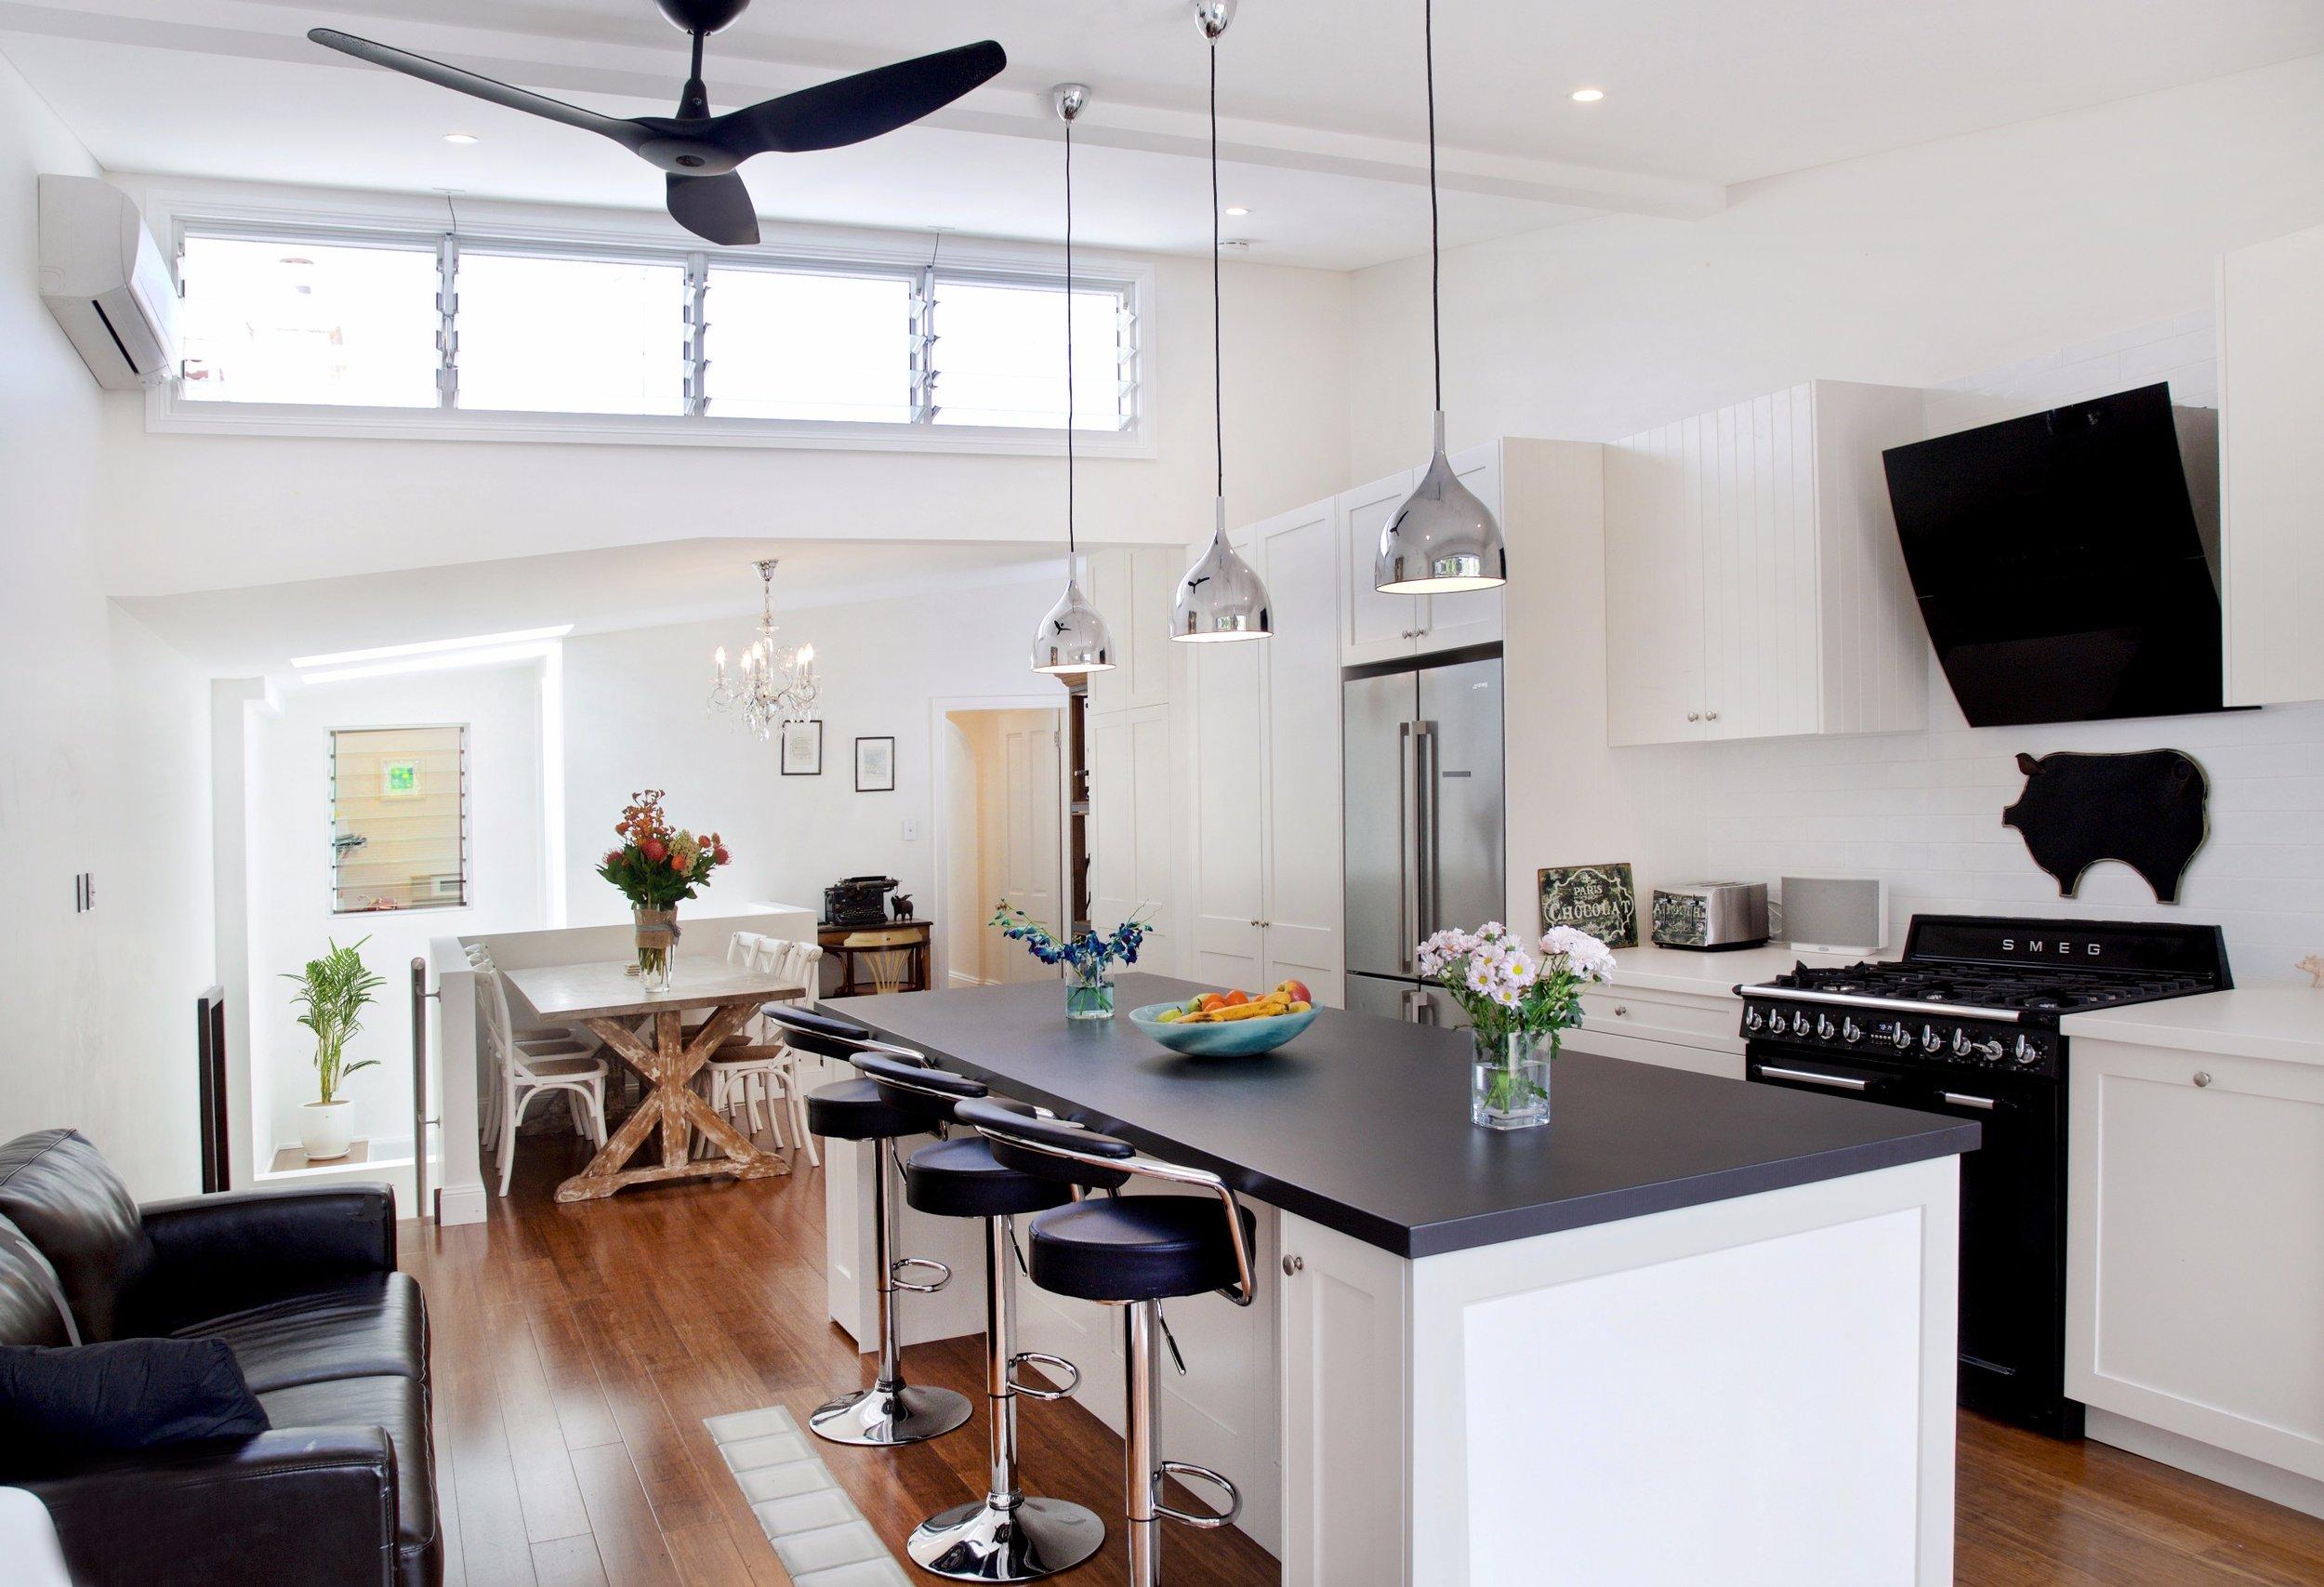 Nvisage_Custom_Design_Homes_Alterations_Additions_Partington9.jpg